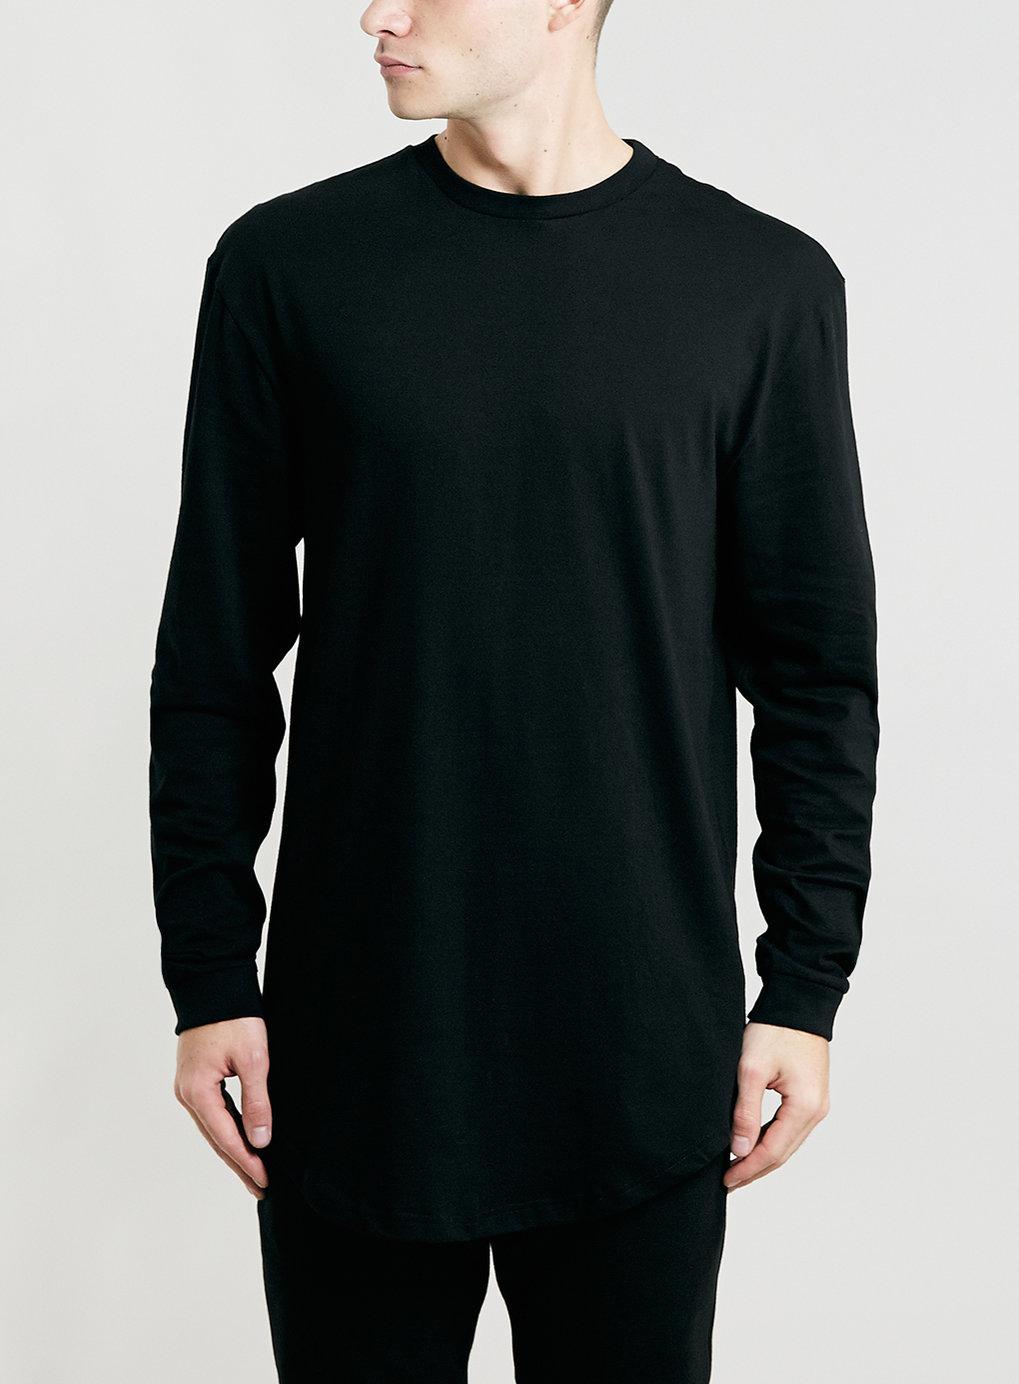 Lac bk longer length long sleeve t shirt in black for men for Long length long sleeve t shirts